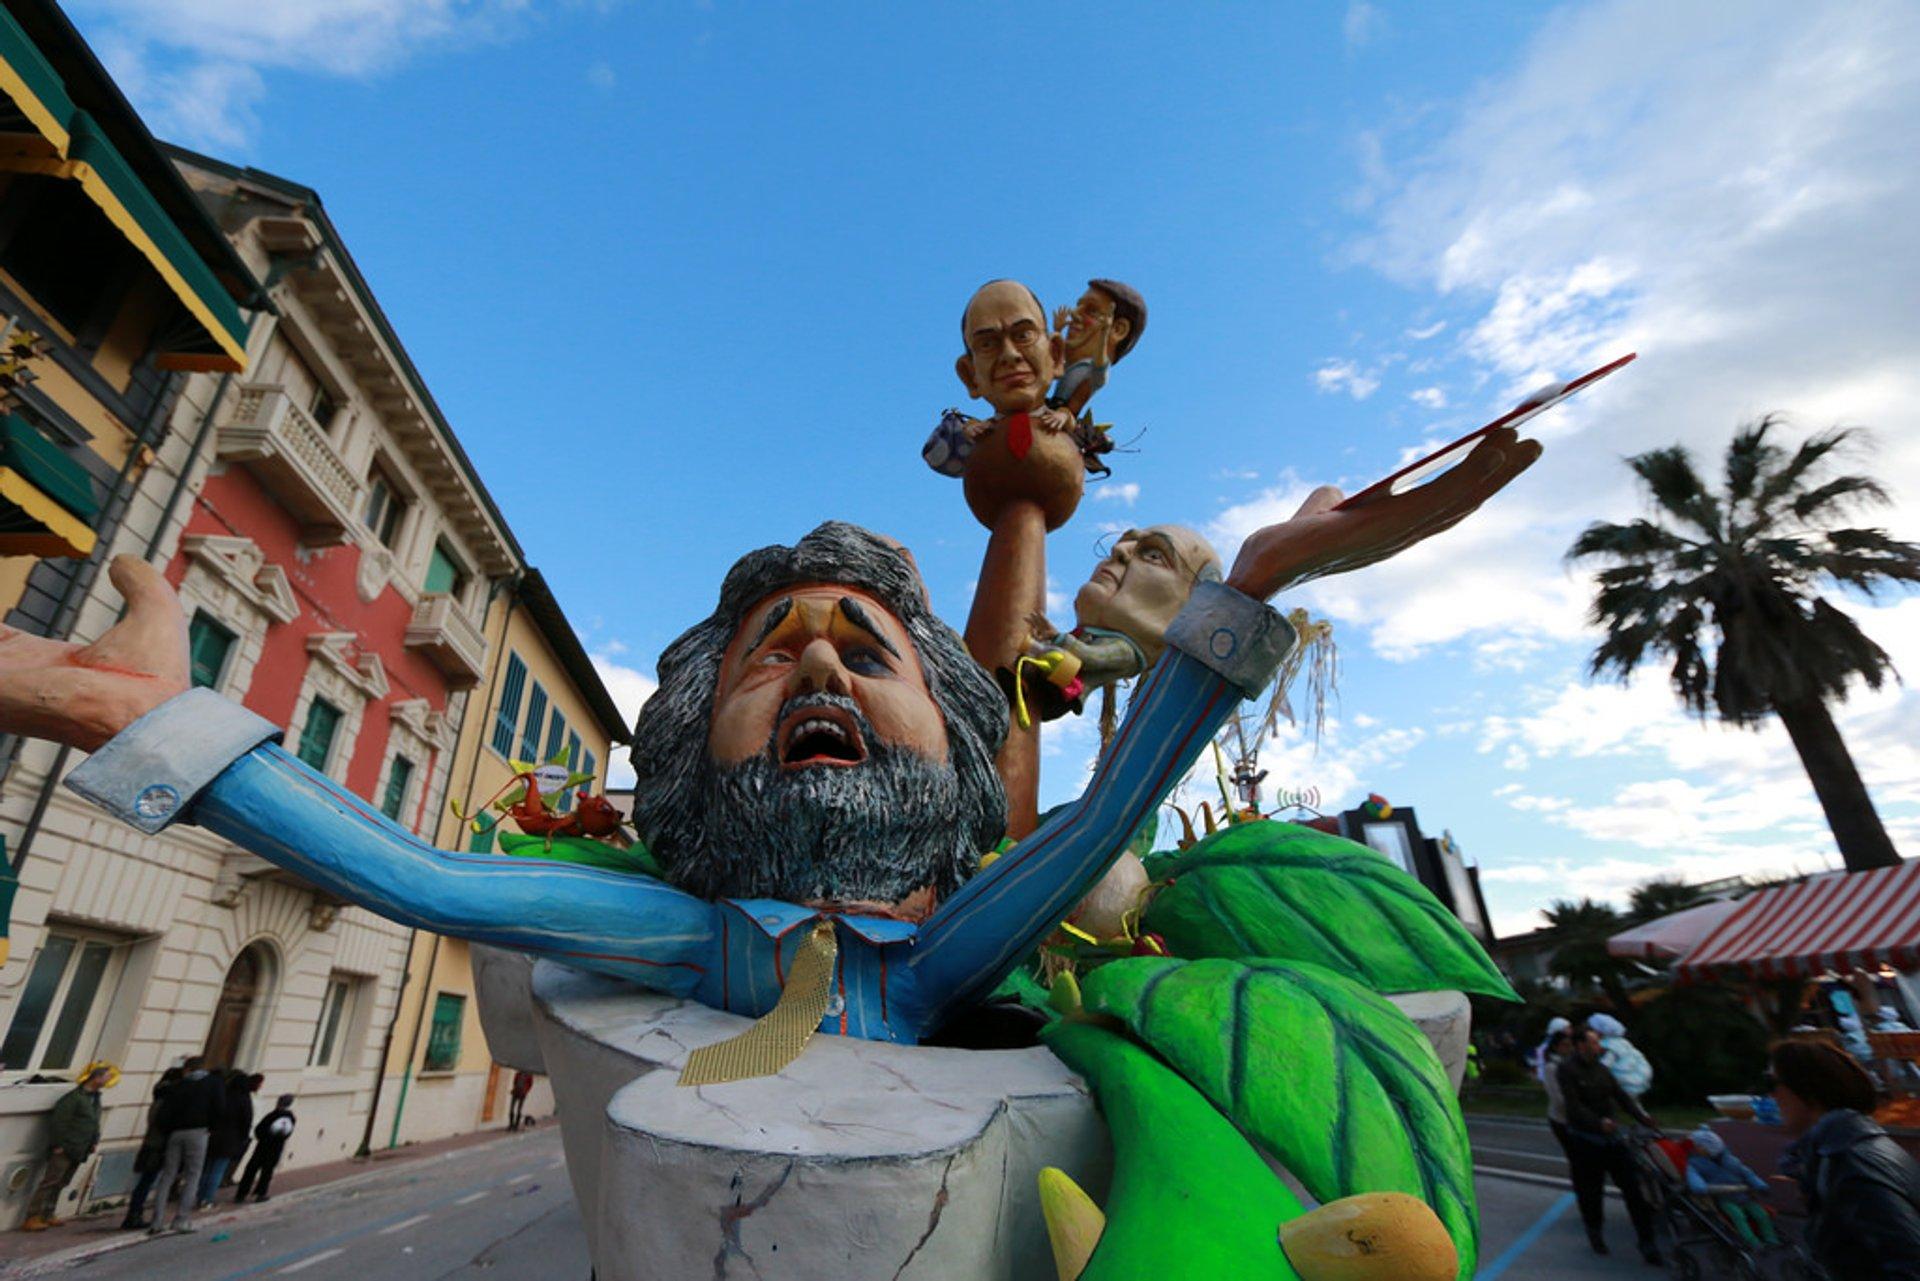 """Pesto alla genovese"" by Michelangelo Francesconi. Viareggio Carnival Parade 2020"